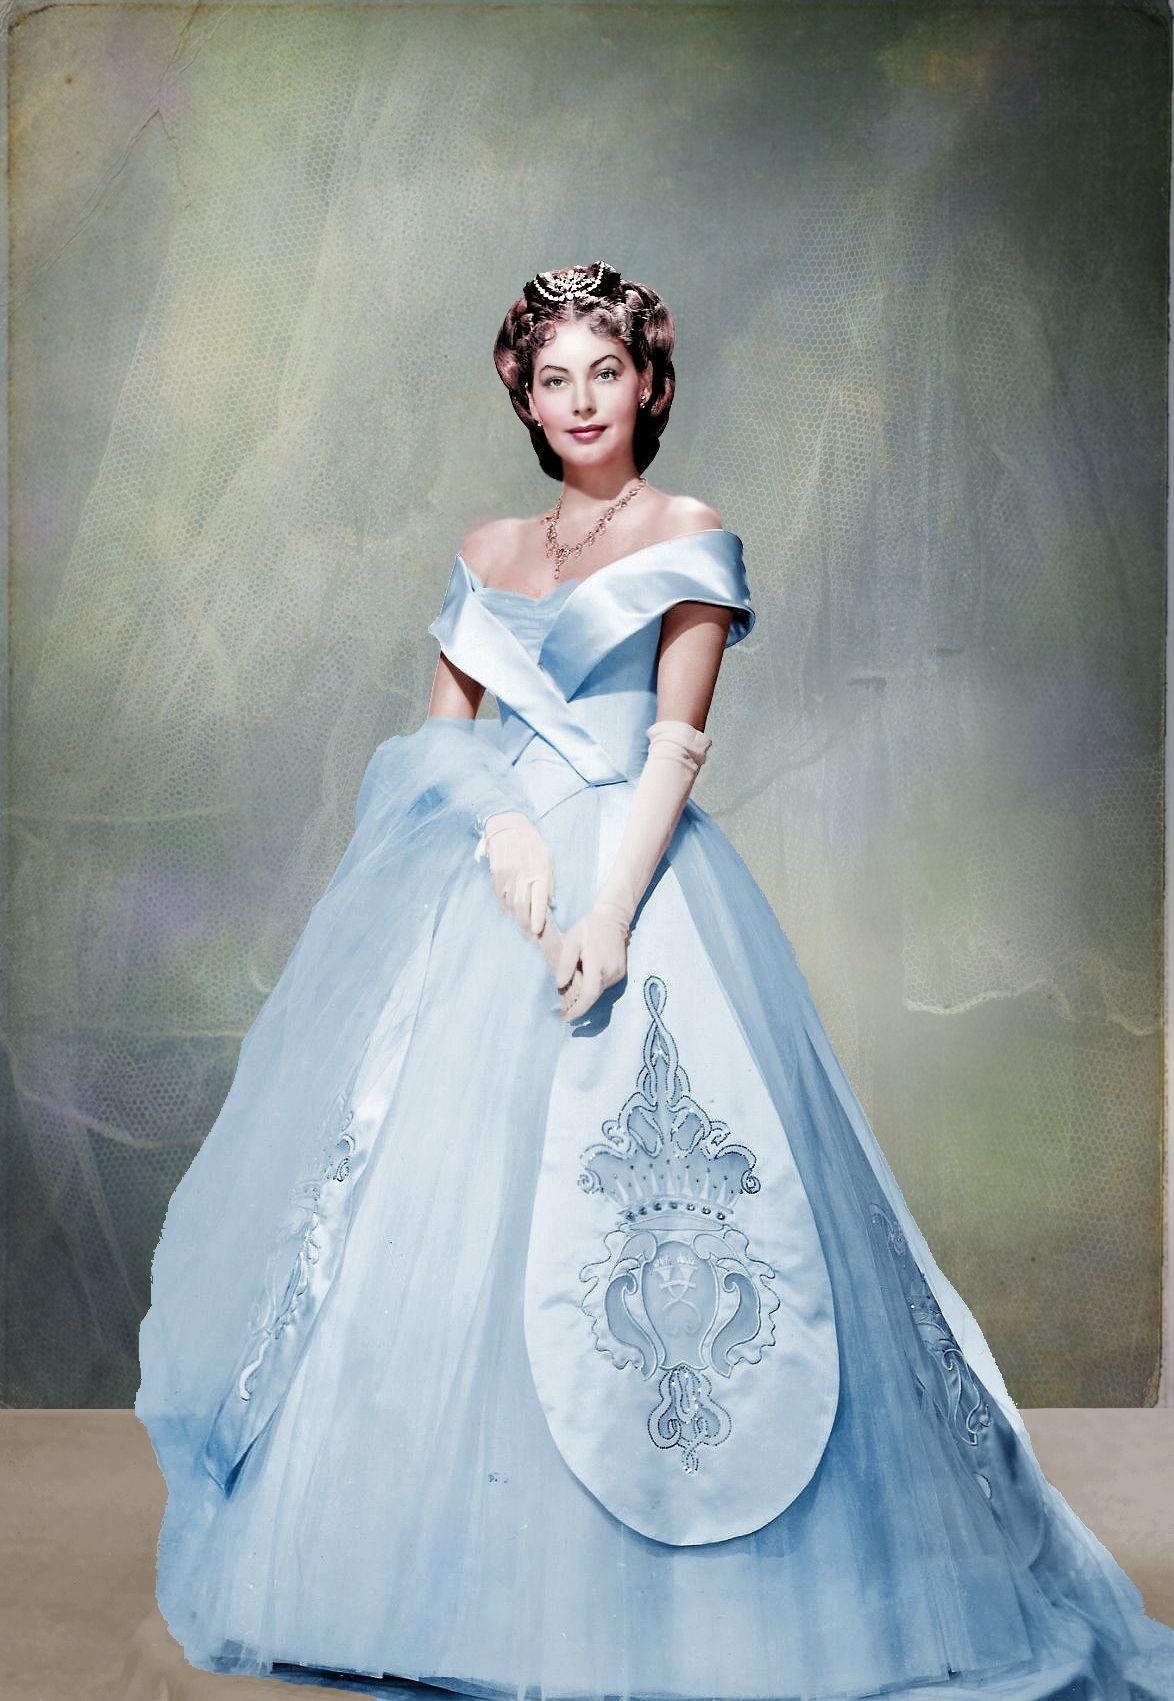 Emejing Ava Gardner Wedding Dress Contemporary - Styles & Ideas 2018 ...